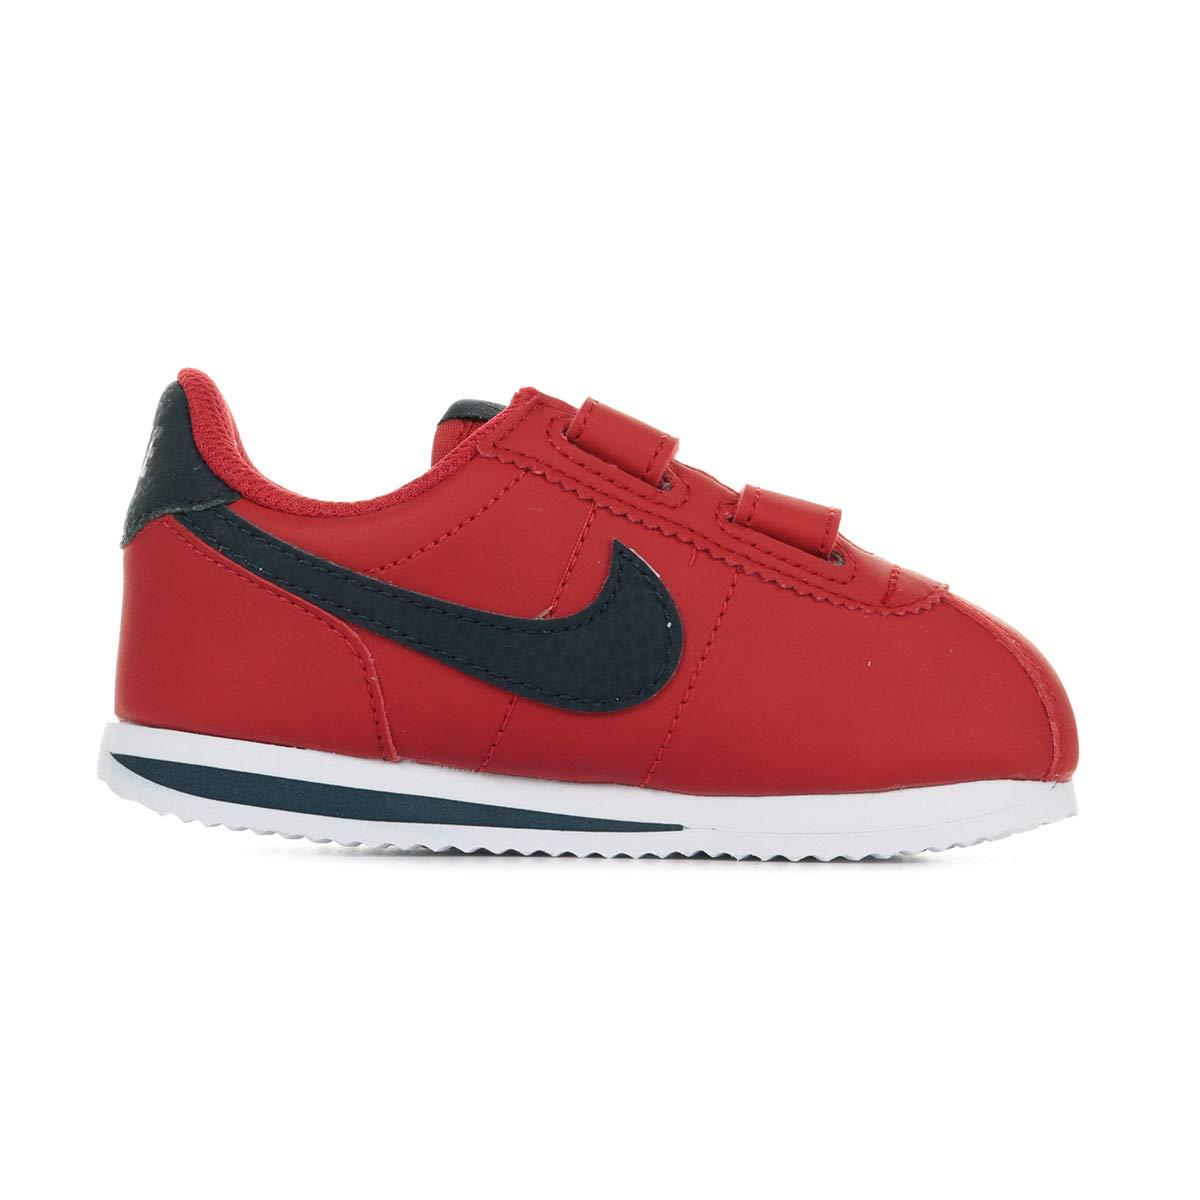 competitive price ae039 2eafb Nike Cortez Basic SL (TDV), Chaussures d Athlétisme garçon  Amazon.fr   Chaussures et Sacs